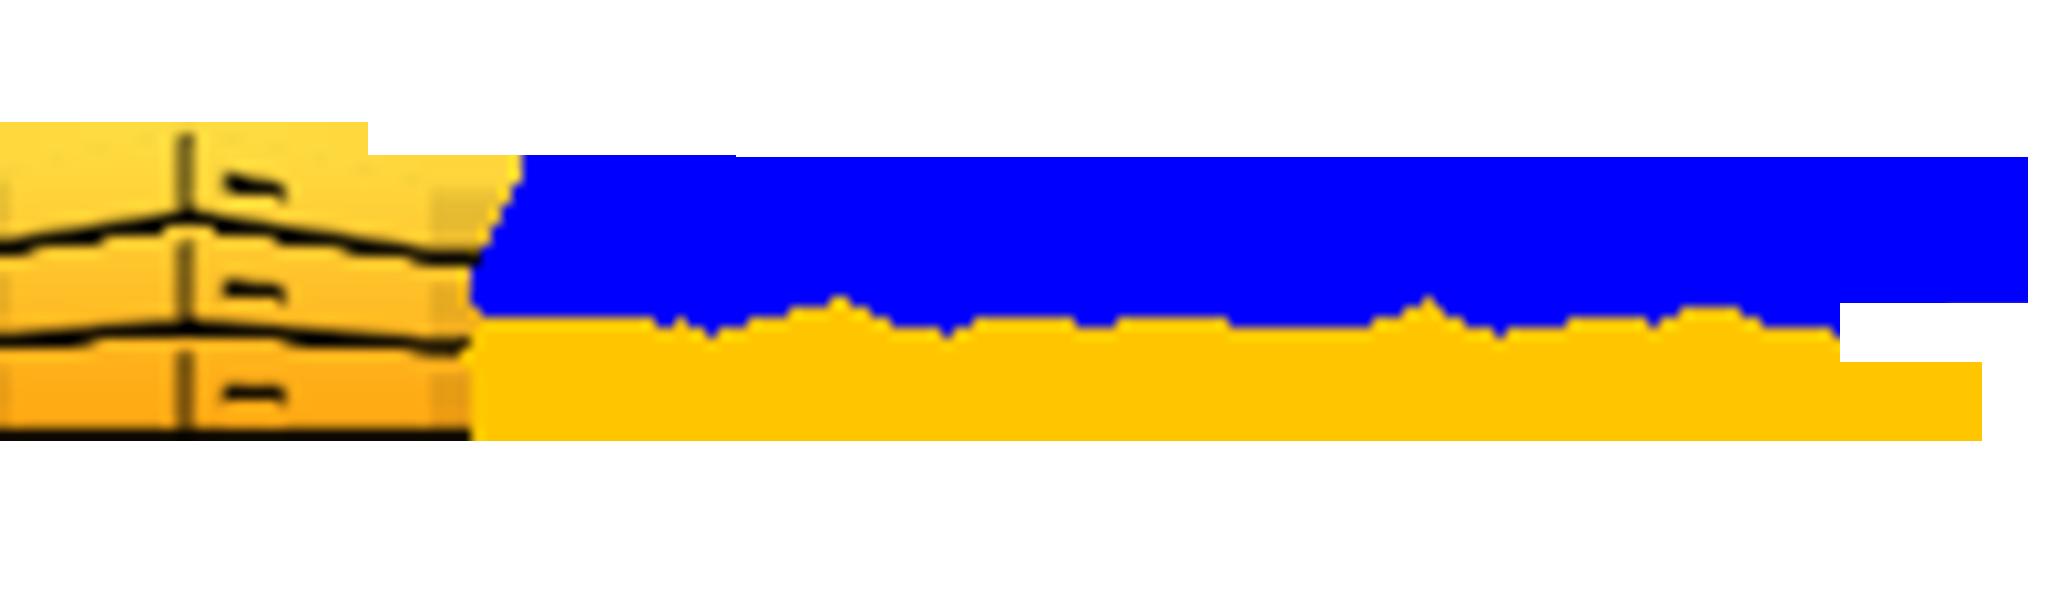 jfoclogo2048x614